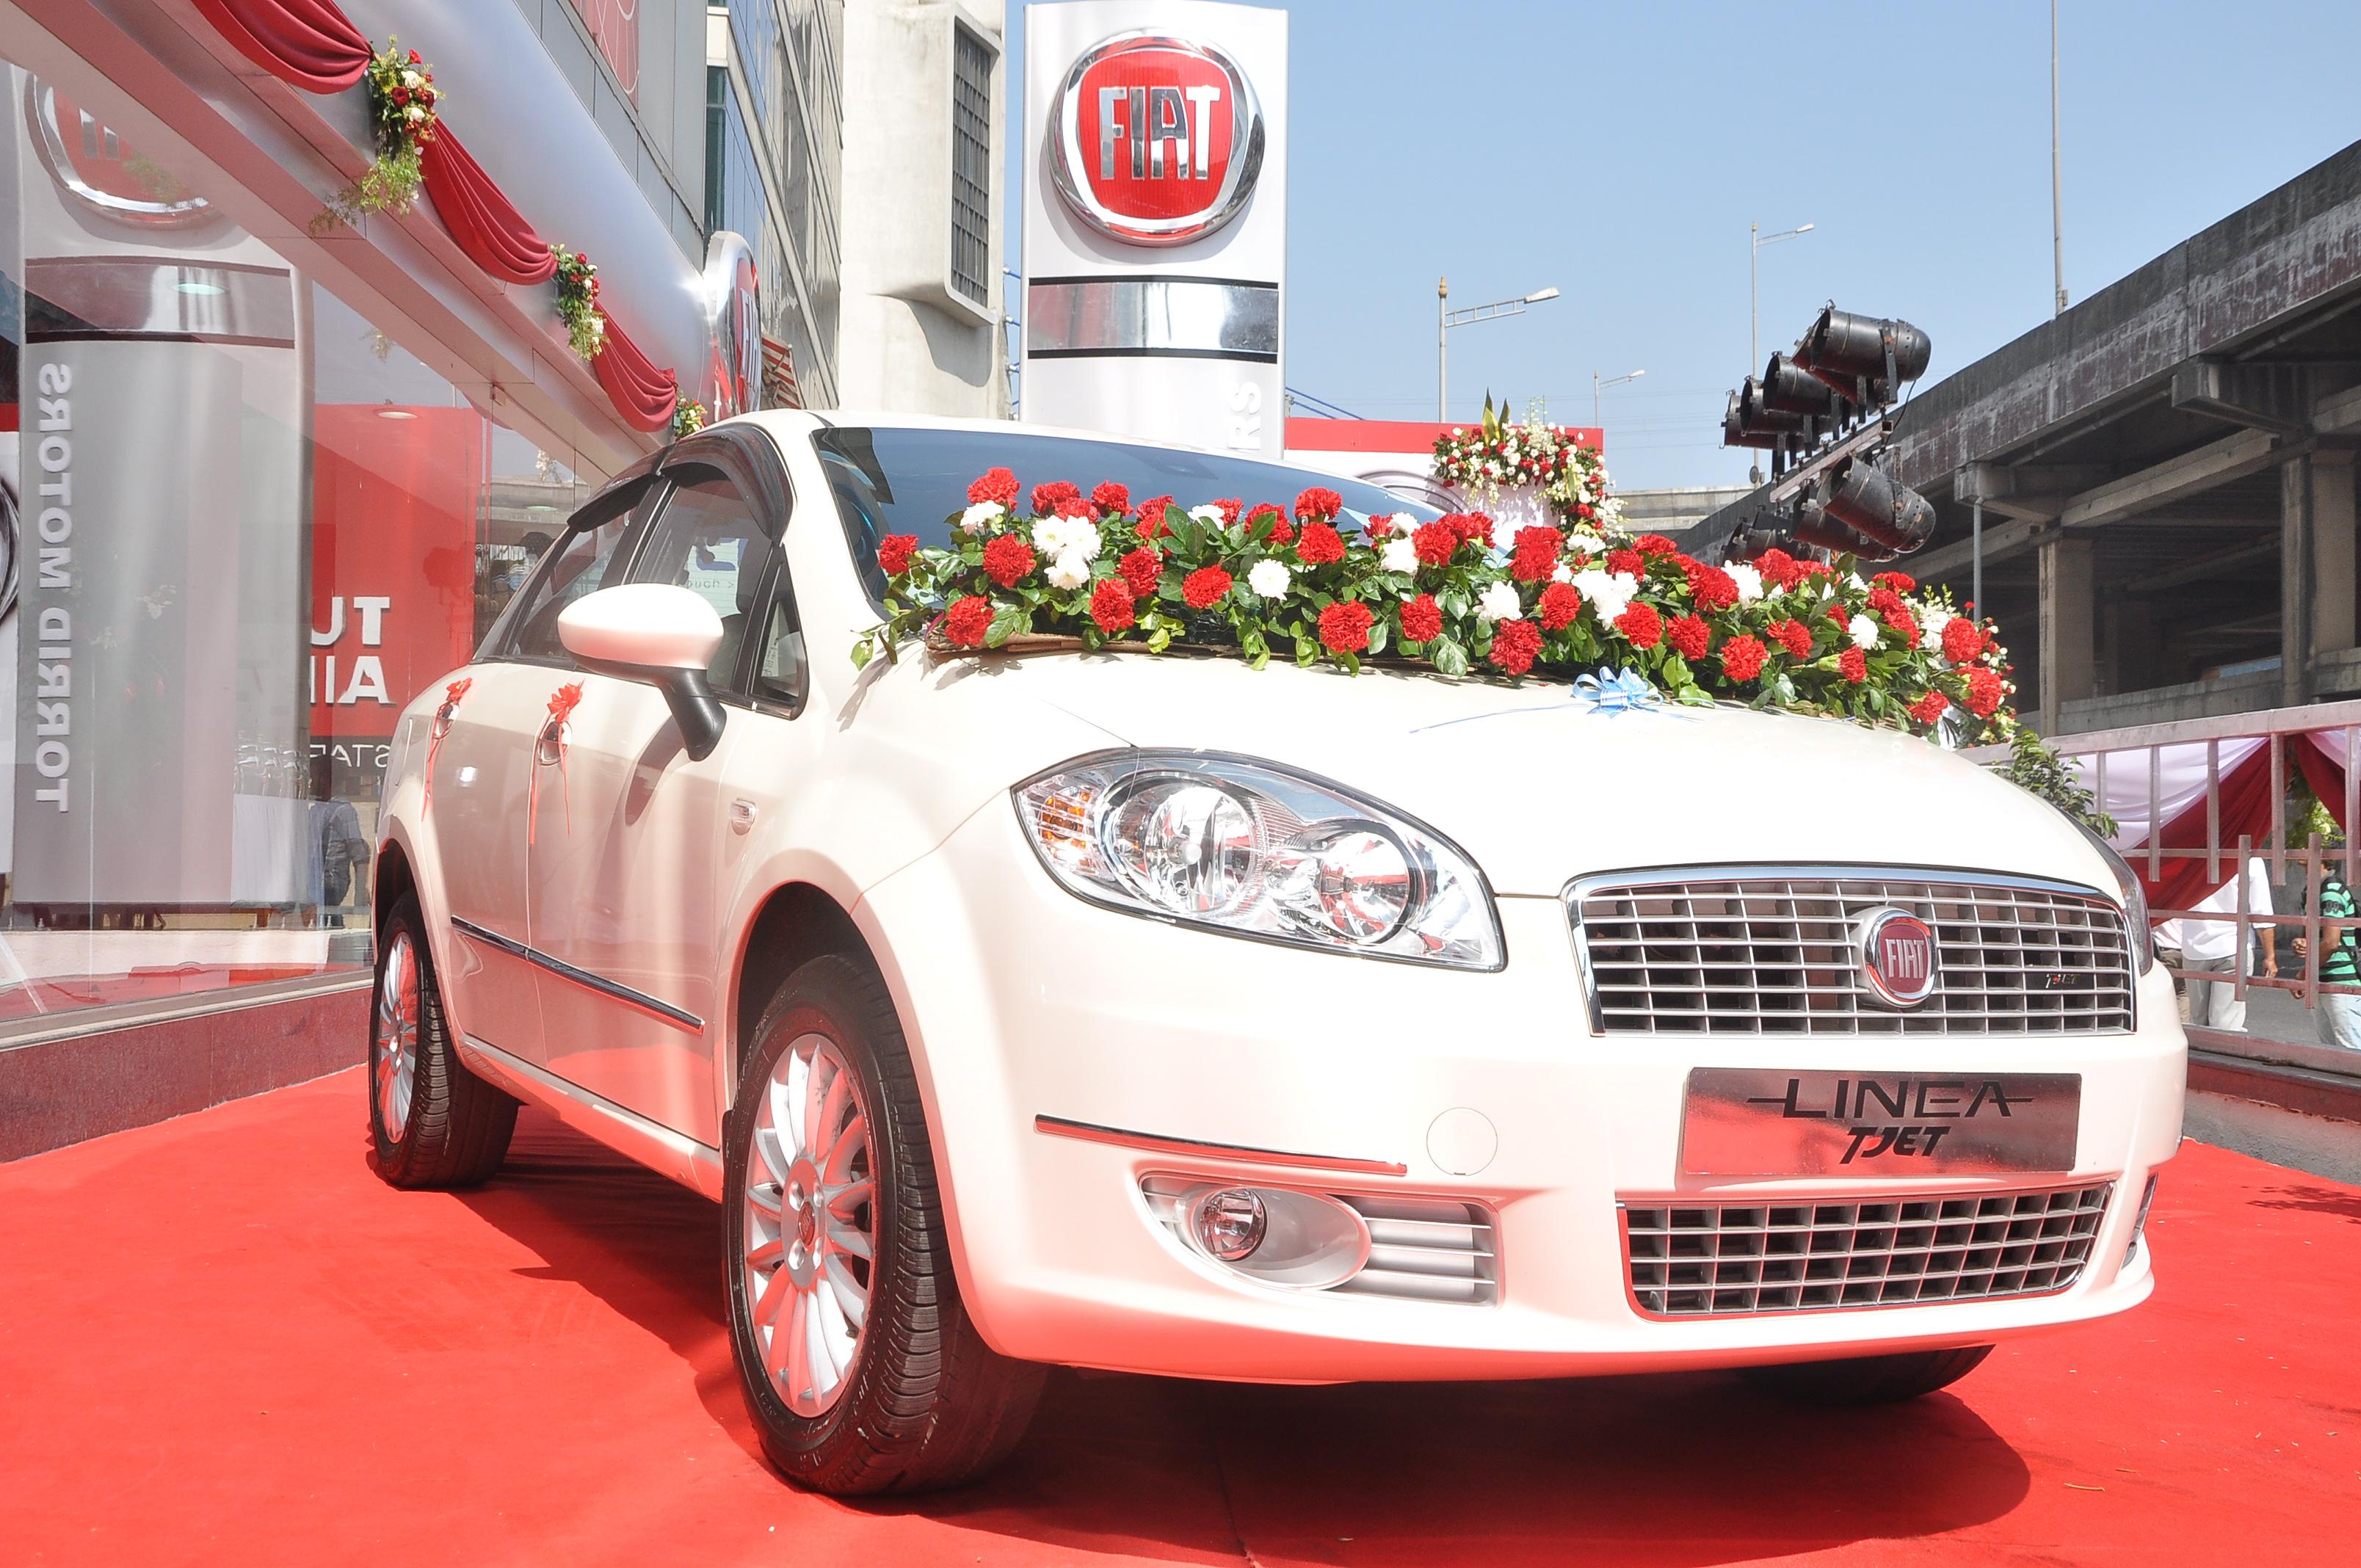 limited details automobiles fiat linea india elegante special features price edition pics